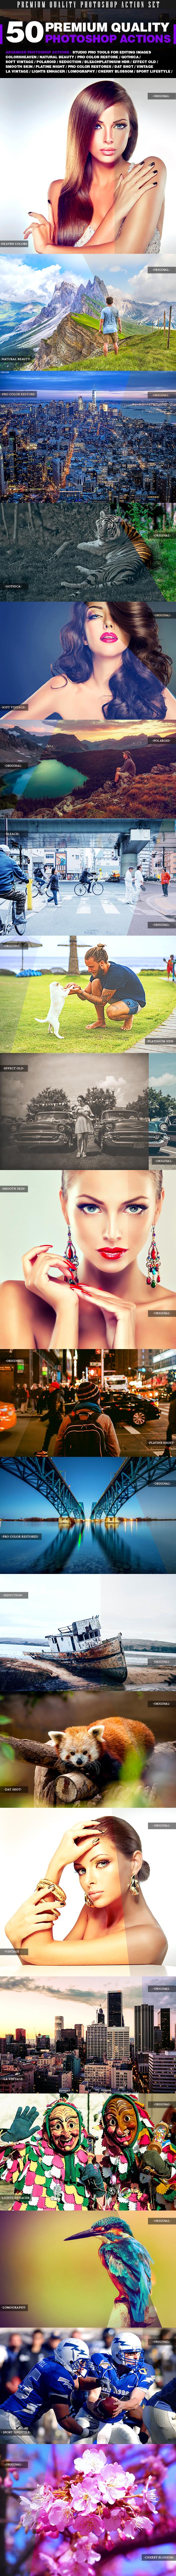 GraphicRiver 50 Premium Quality Photoshop Actions Set 20651085